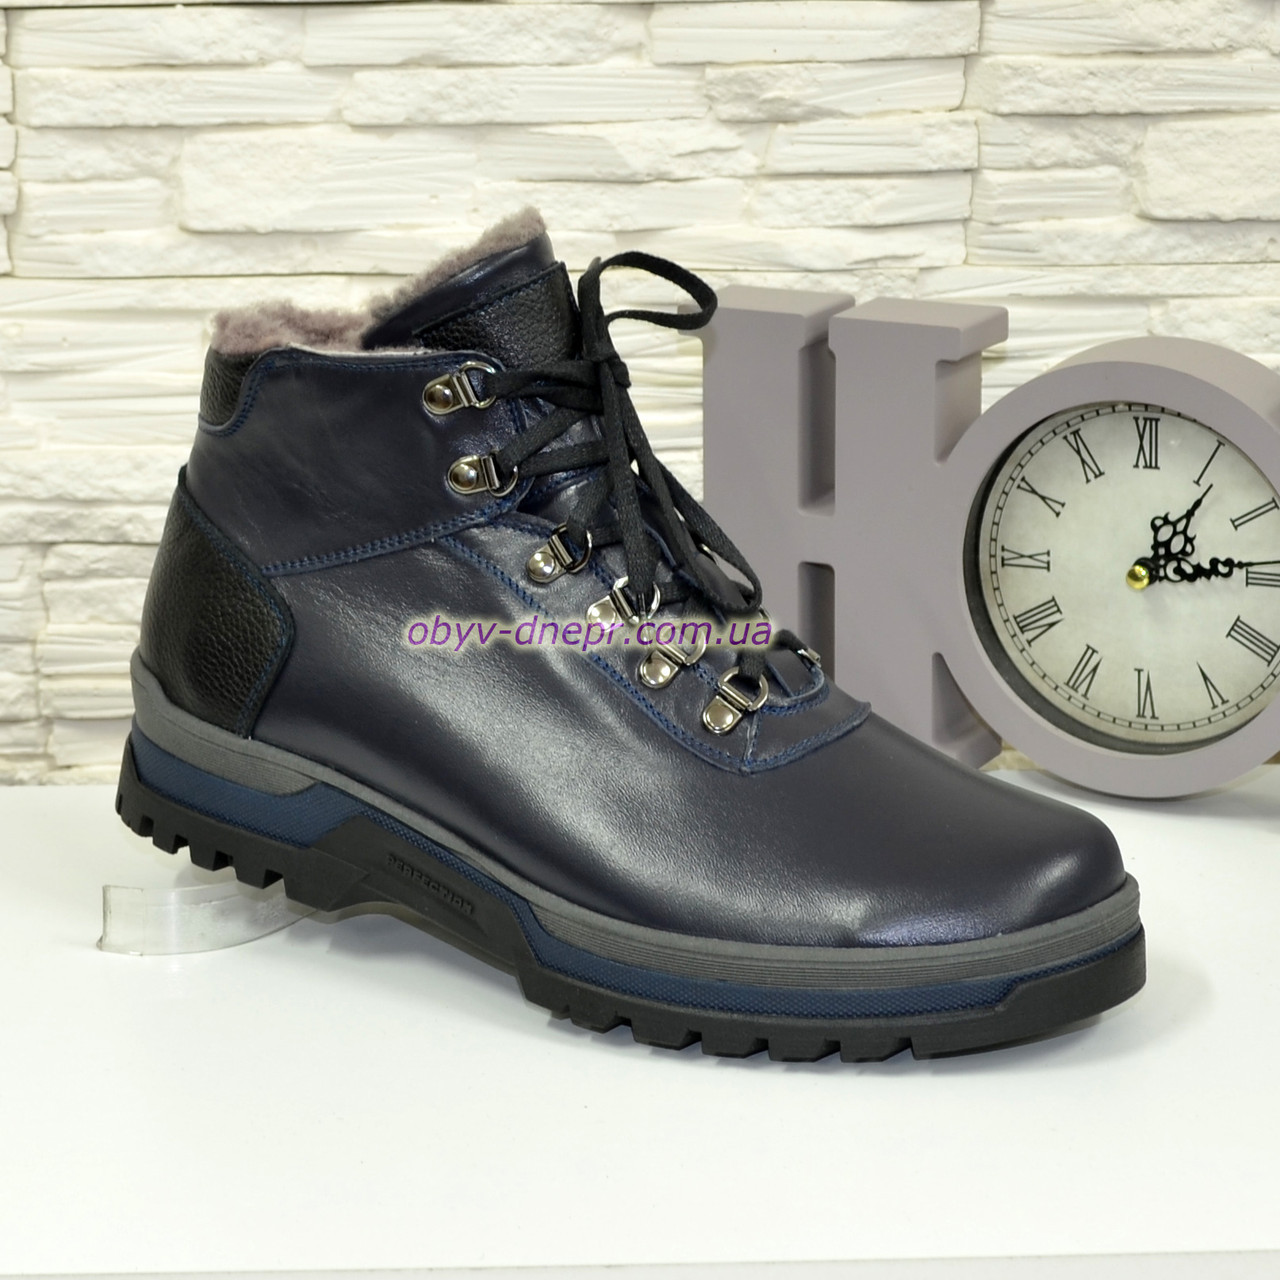 e37e16b727da Ботинки мужские на шнуровке, натуральная синяя кожа   продажа, цена ...